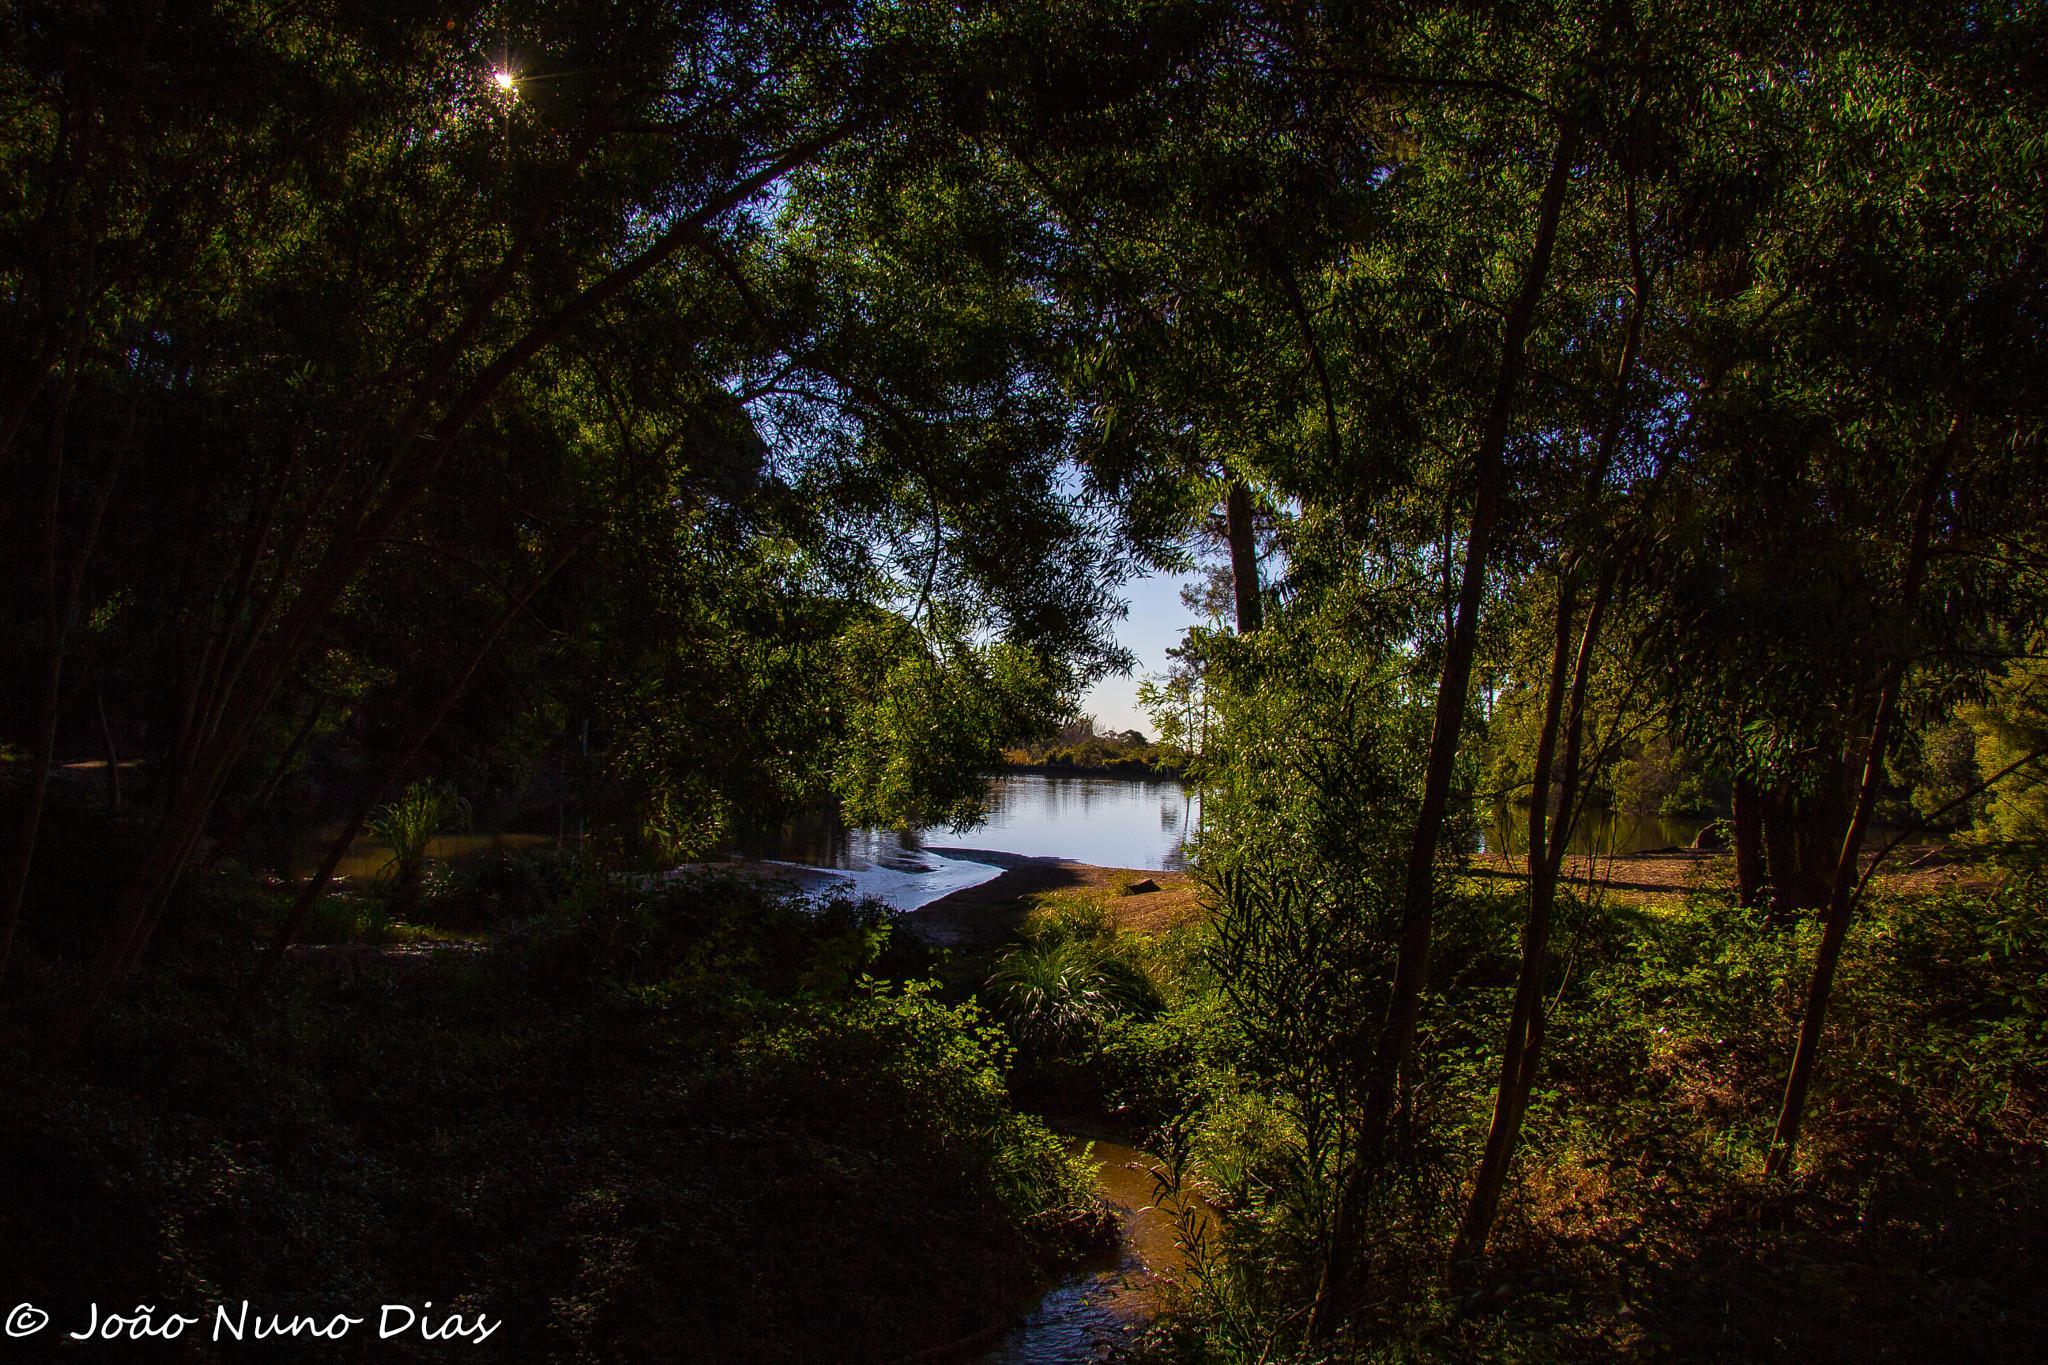 Into the bush by Nuno Dias